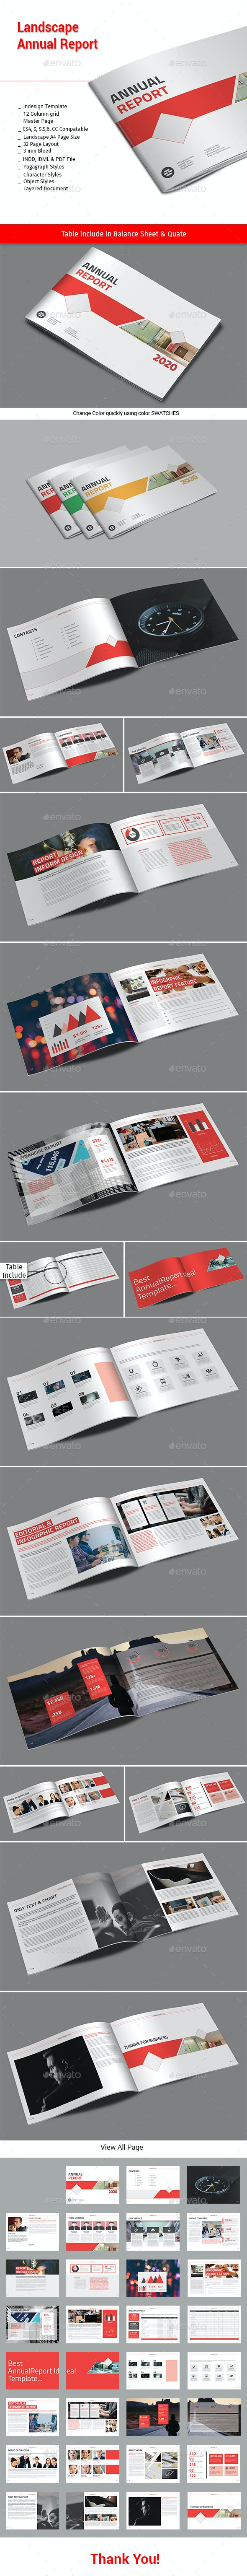 Landscape Annual Report - Informational Brochures